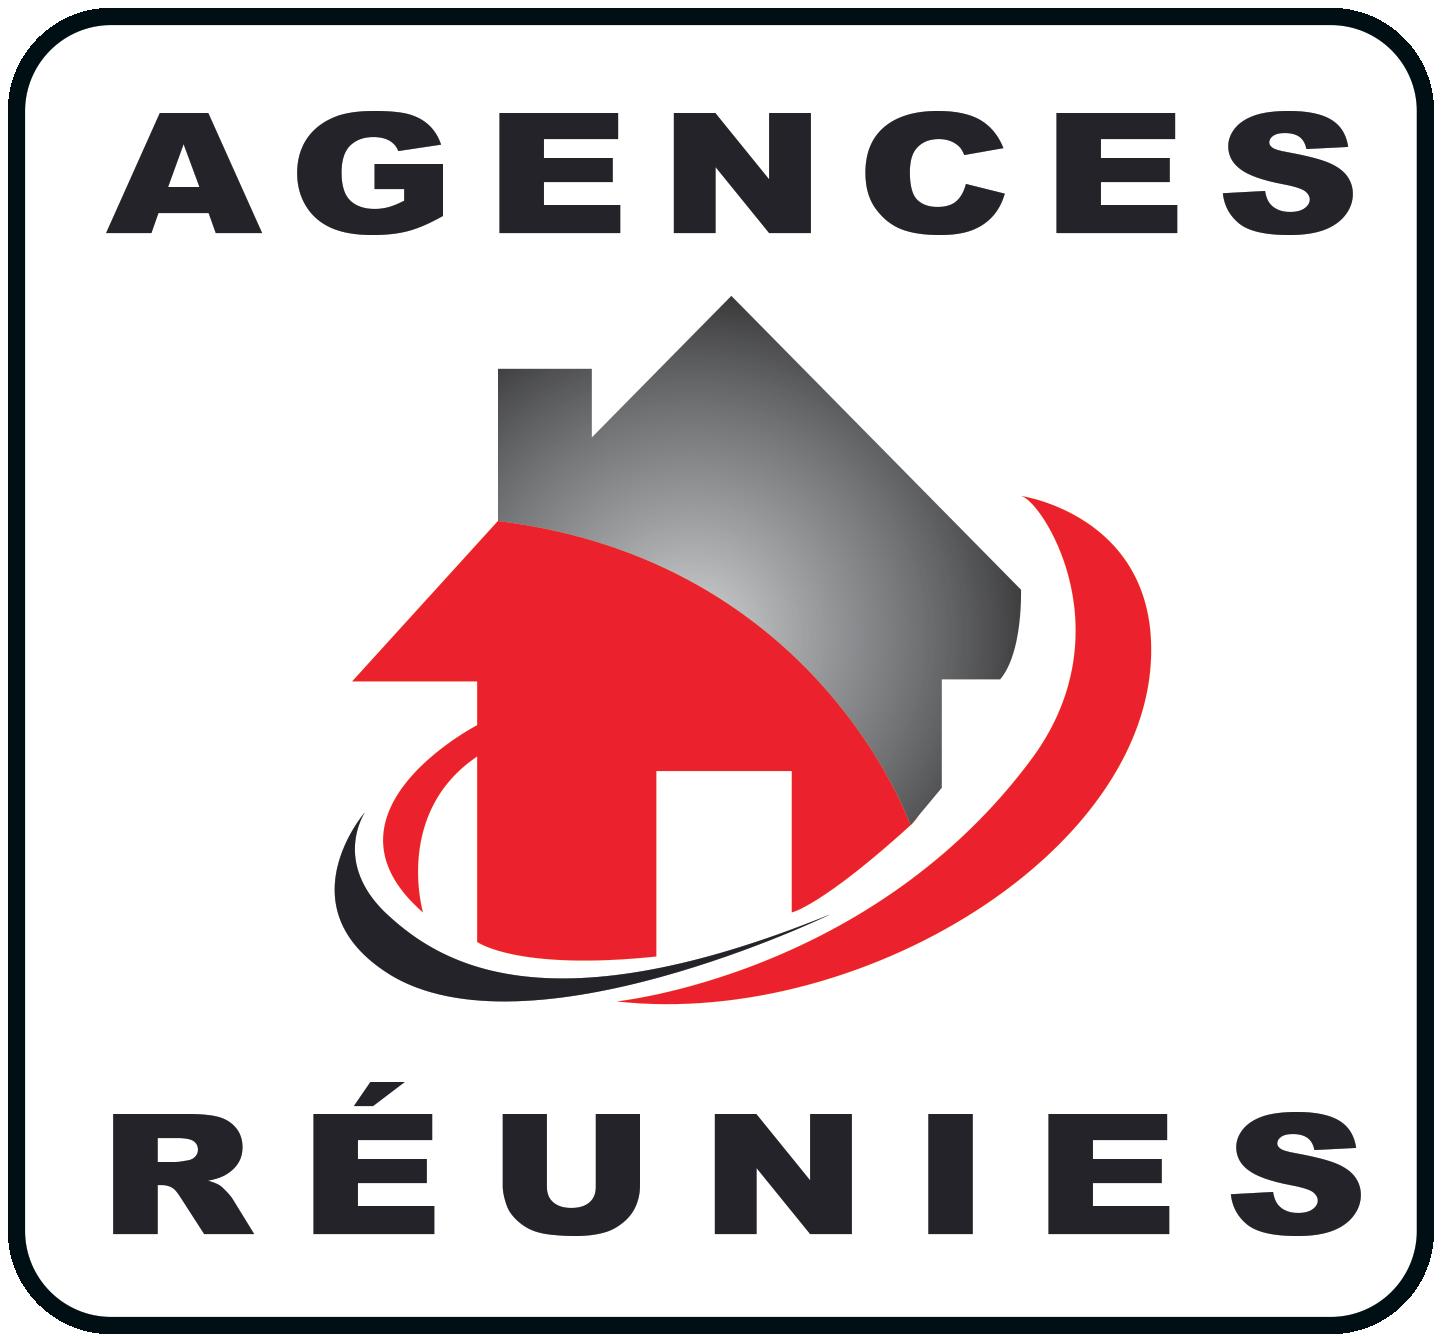 Agence Sautron Immobilier agence immobilière Sautron (44880)